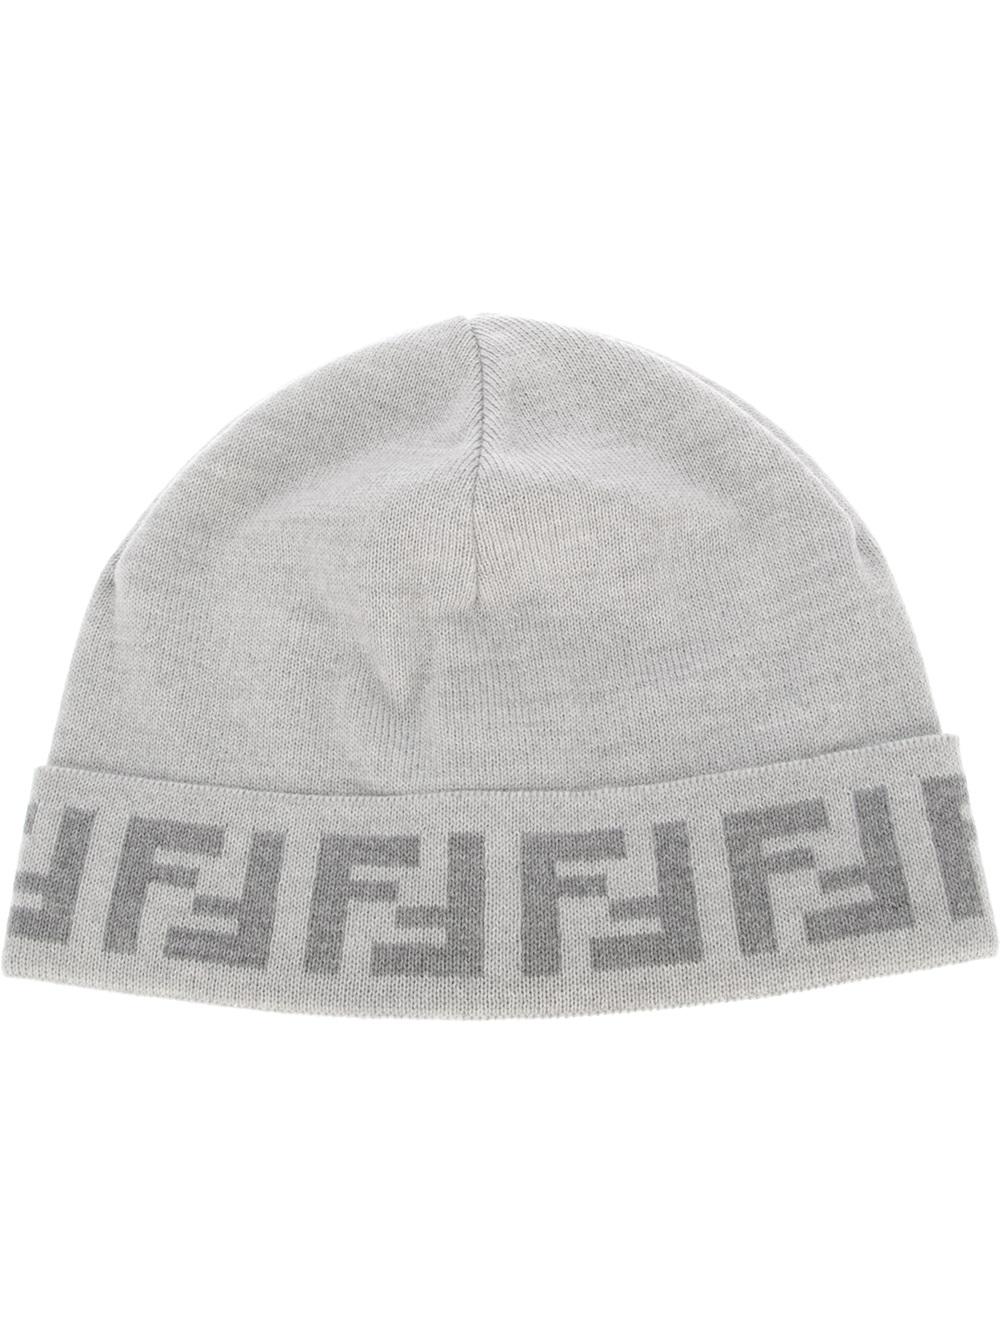 425040dd117 Lyst - Fendi Wool Beanie Hat in Gray